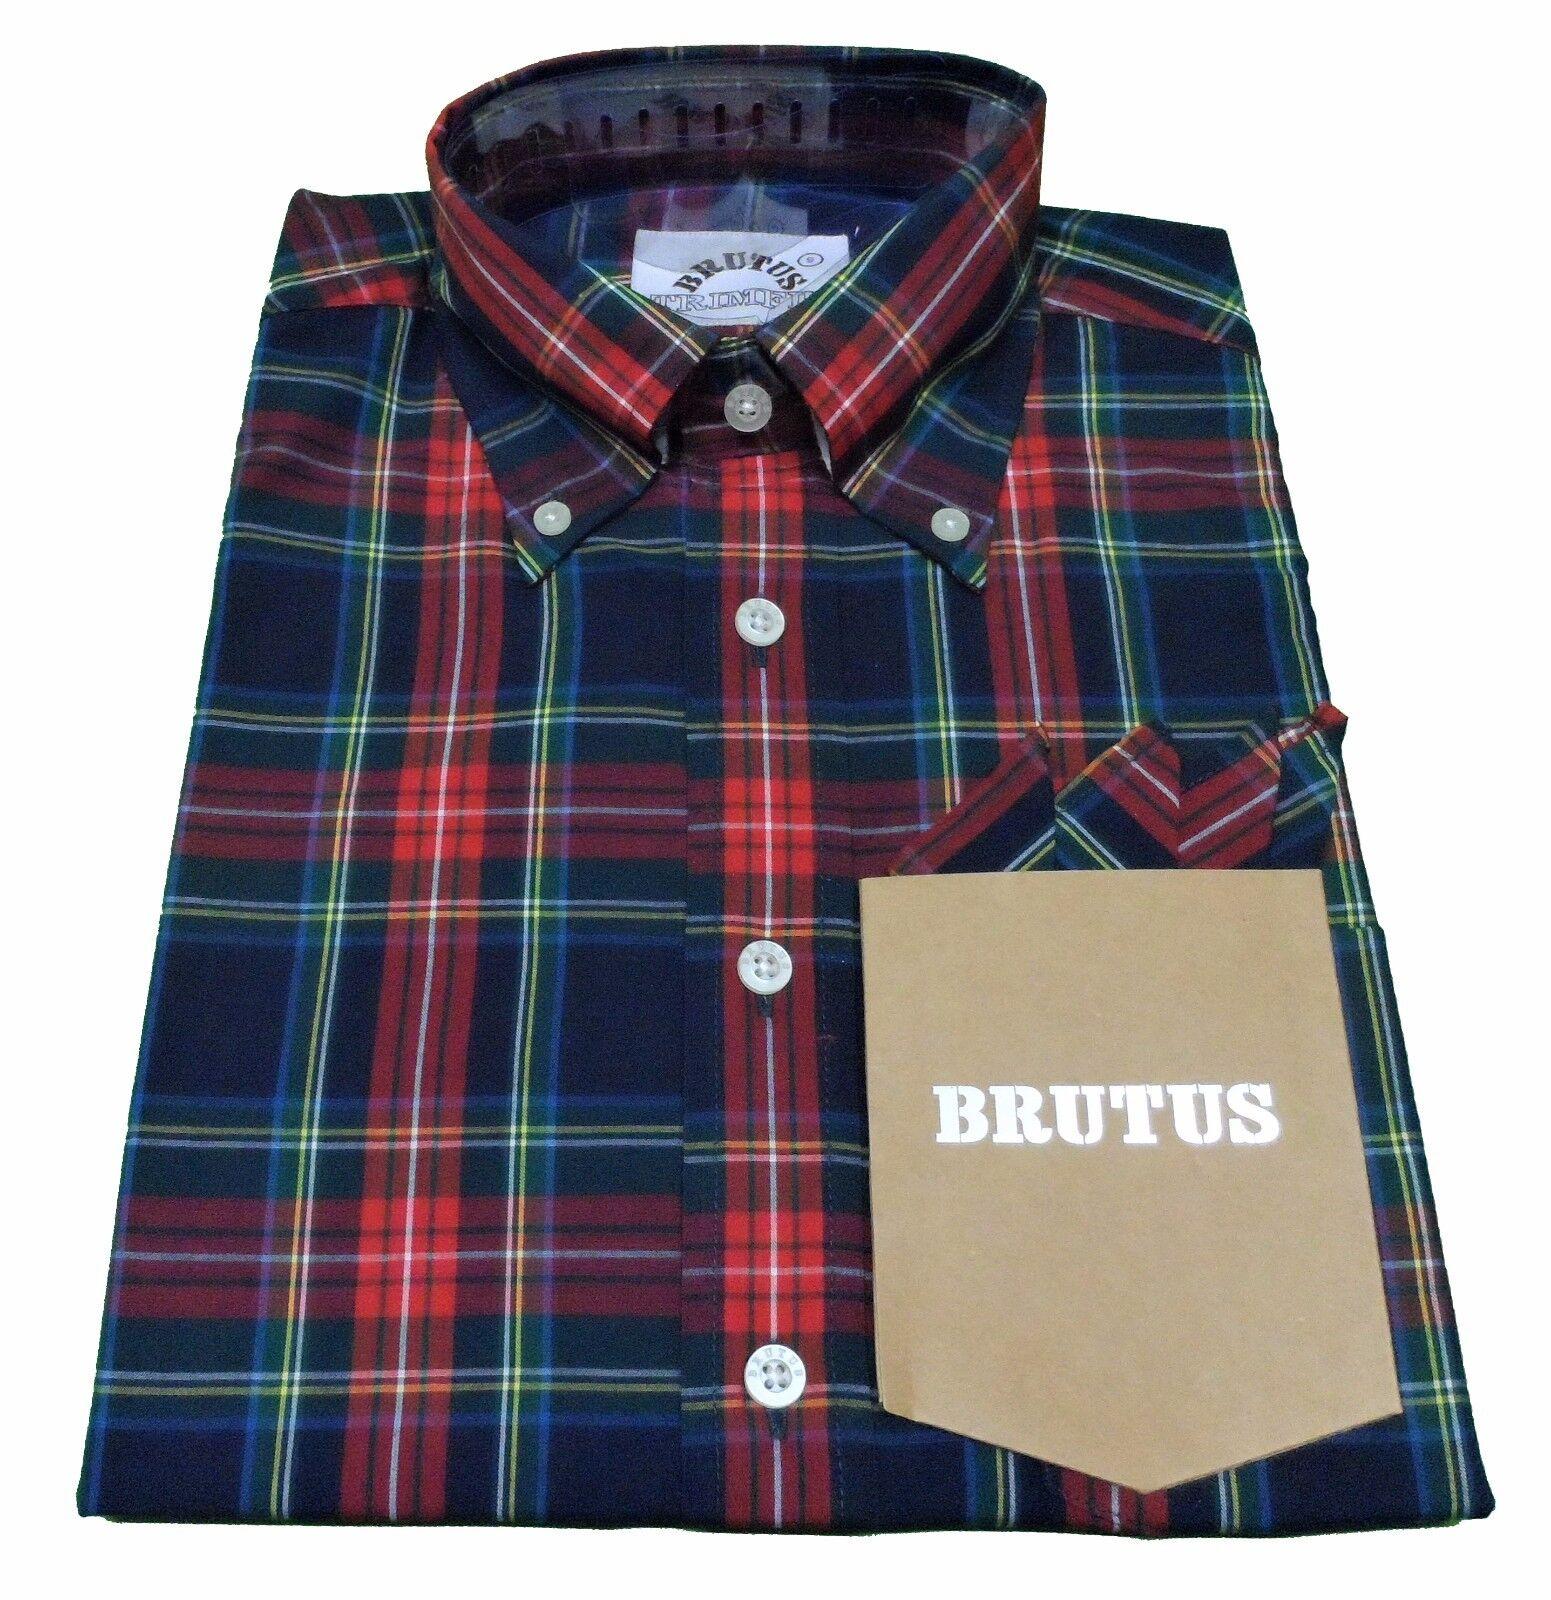 BRUTUS 115 Maniche Corte Vintage con MOD button down shirts